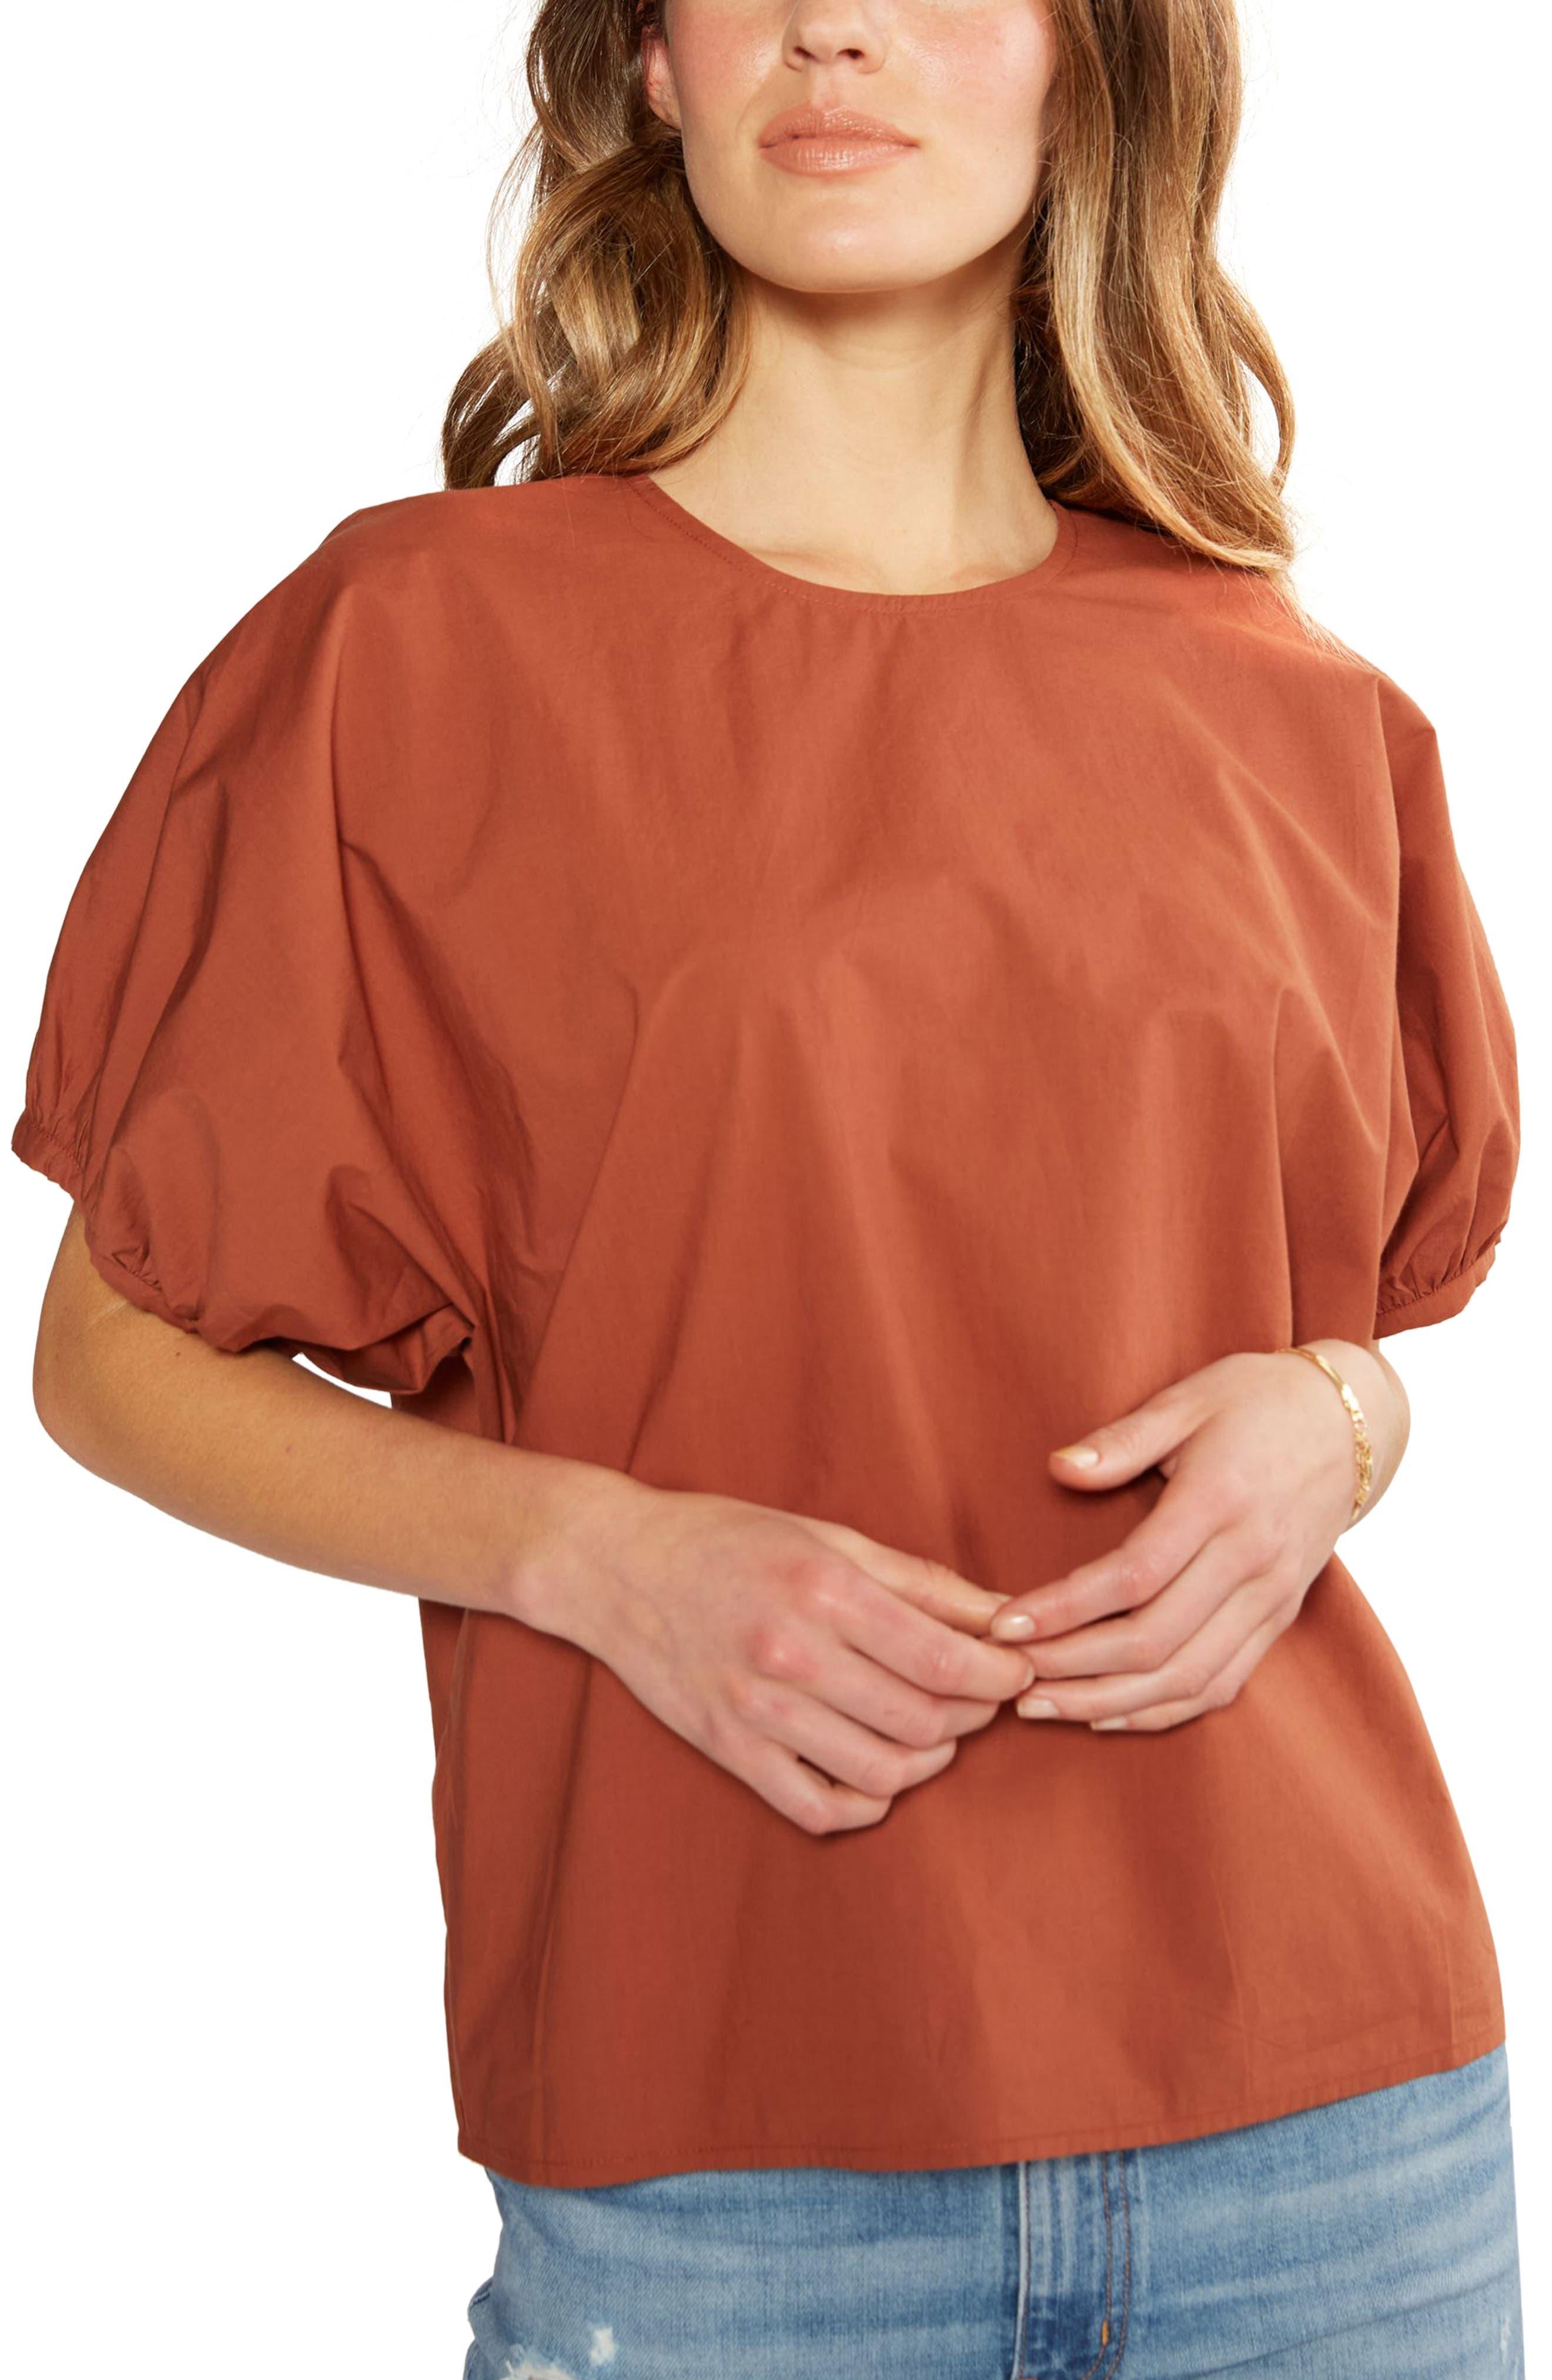 Women's Etica Tempeste Puff Sleeve Organic Cotton Top